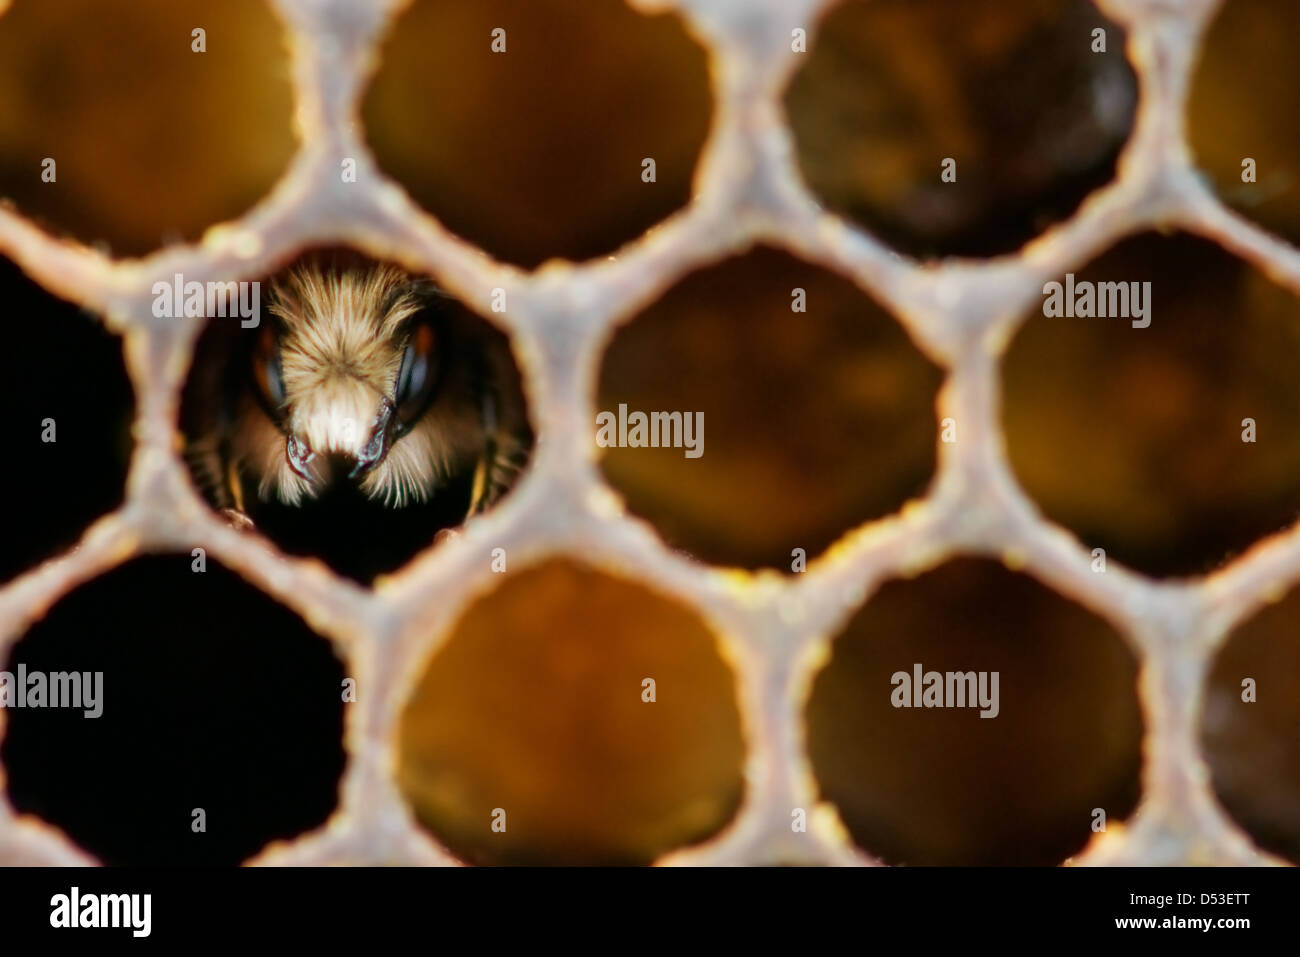 yong bee inside honeycomb closeup Stock Photo